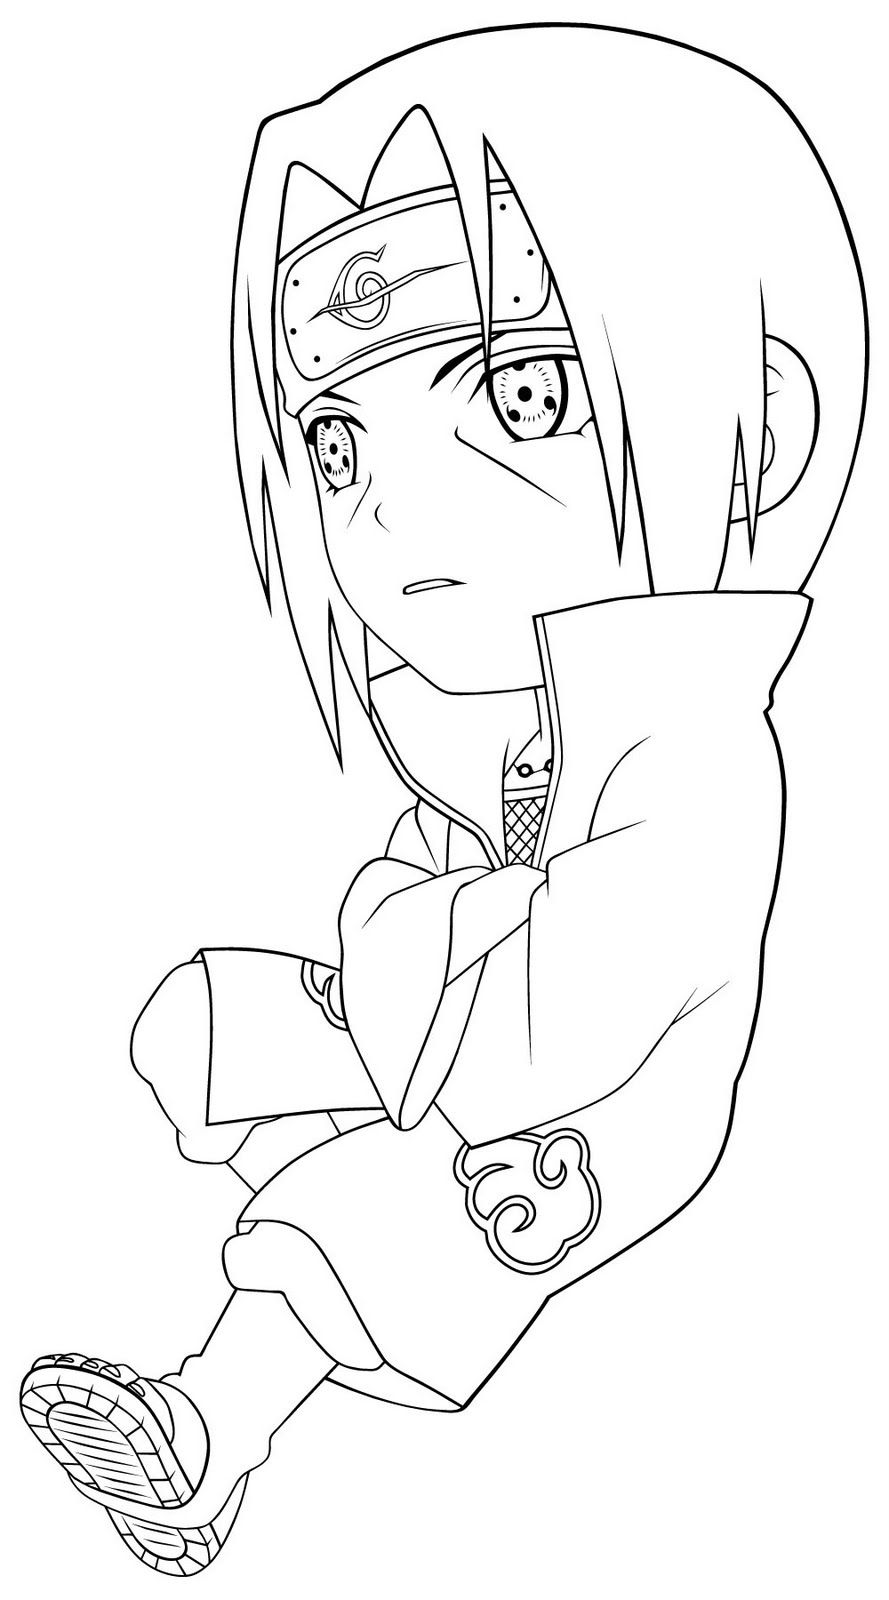 cool naruto sasuke Ausmalbilder zum ausdrucken ausdrucken